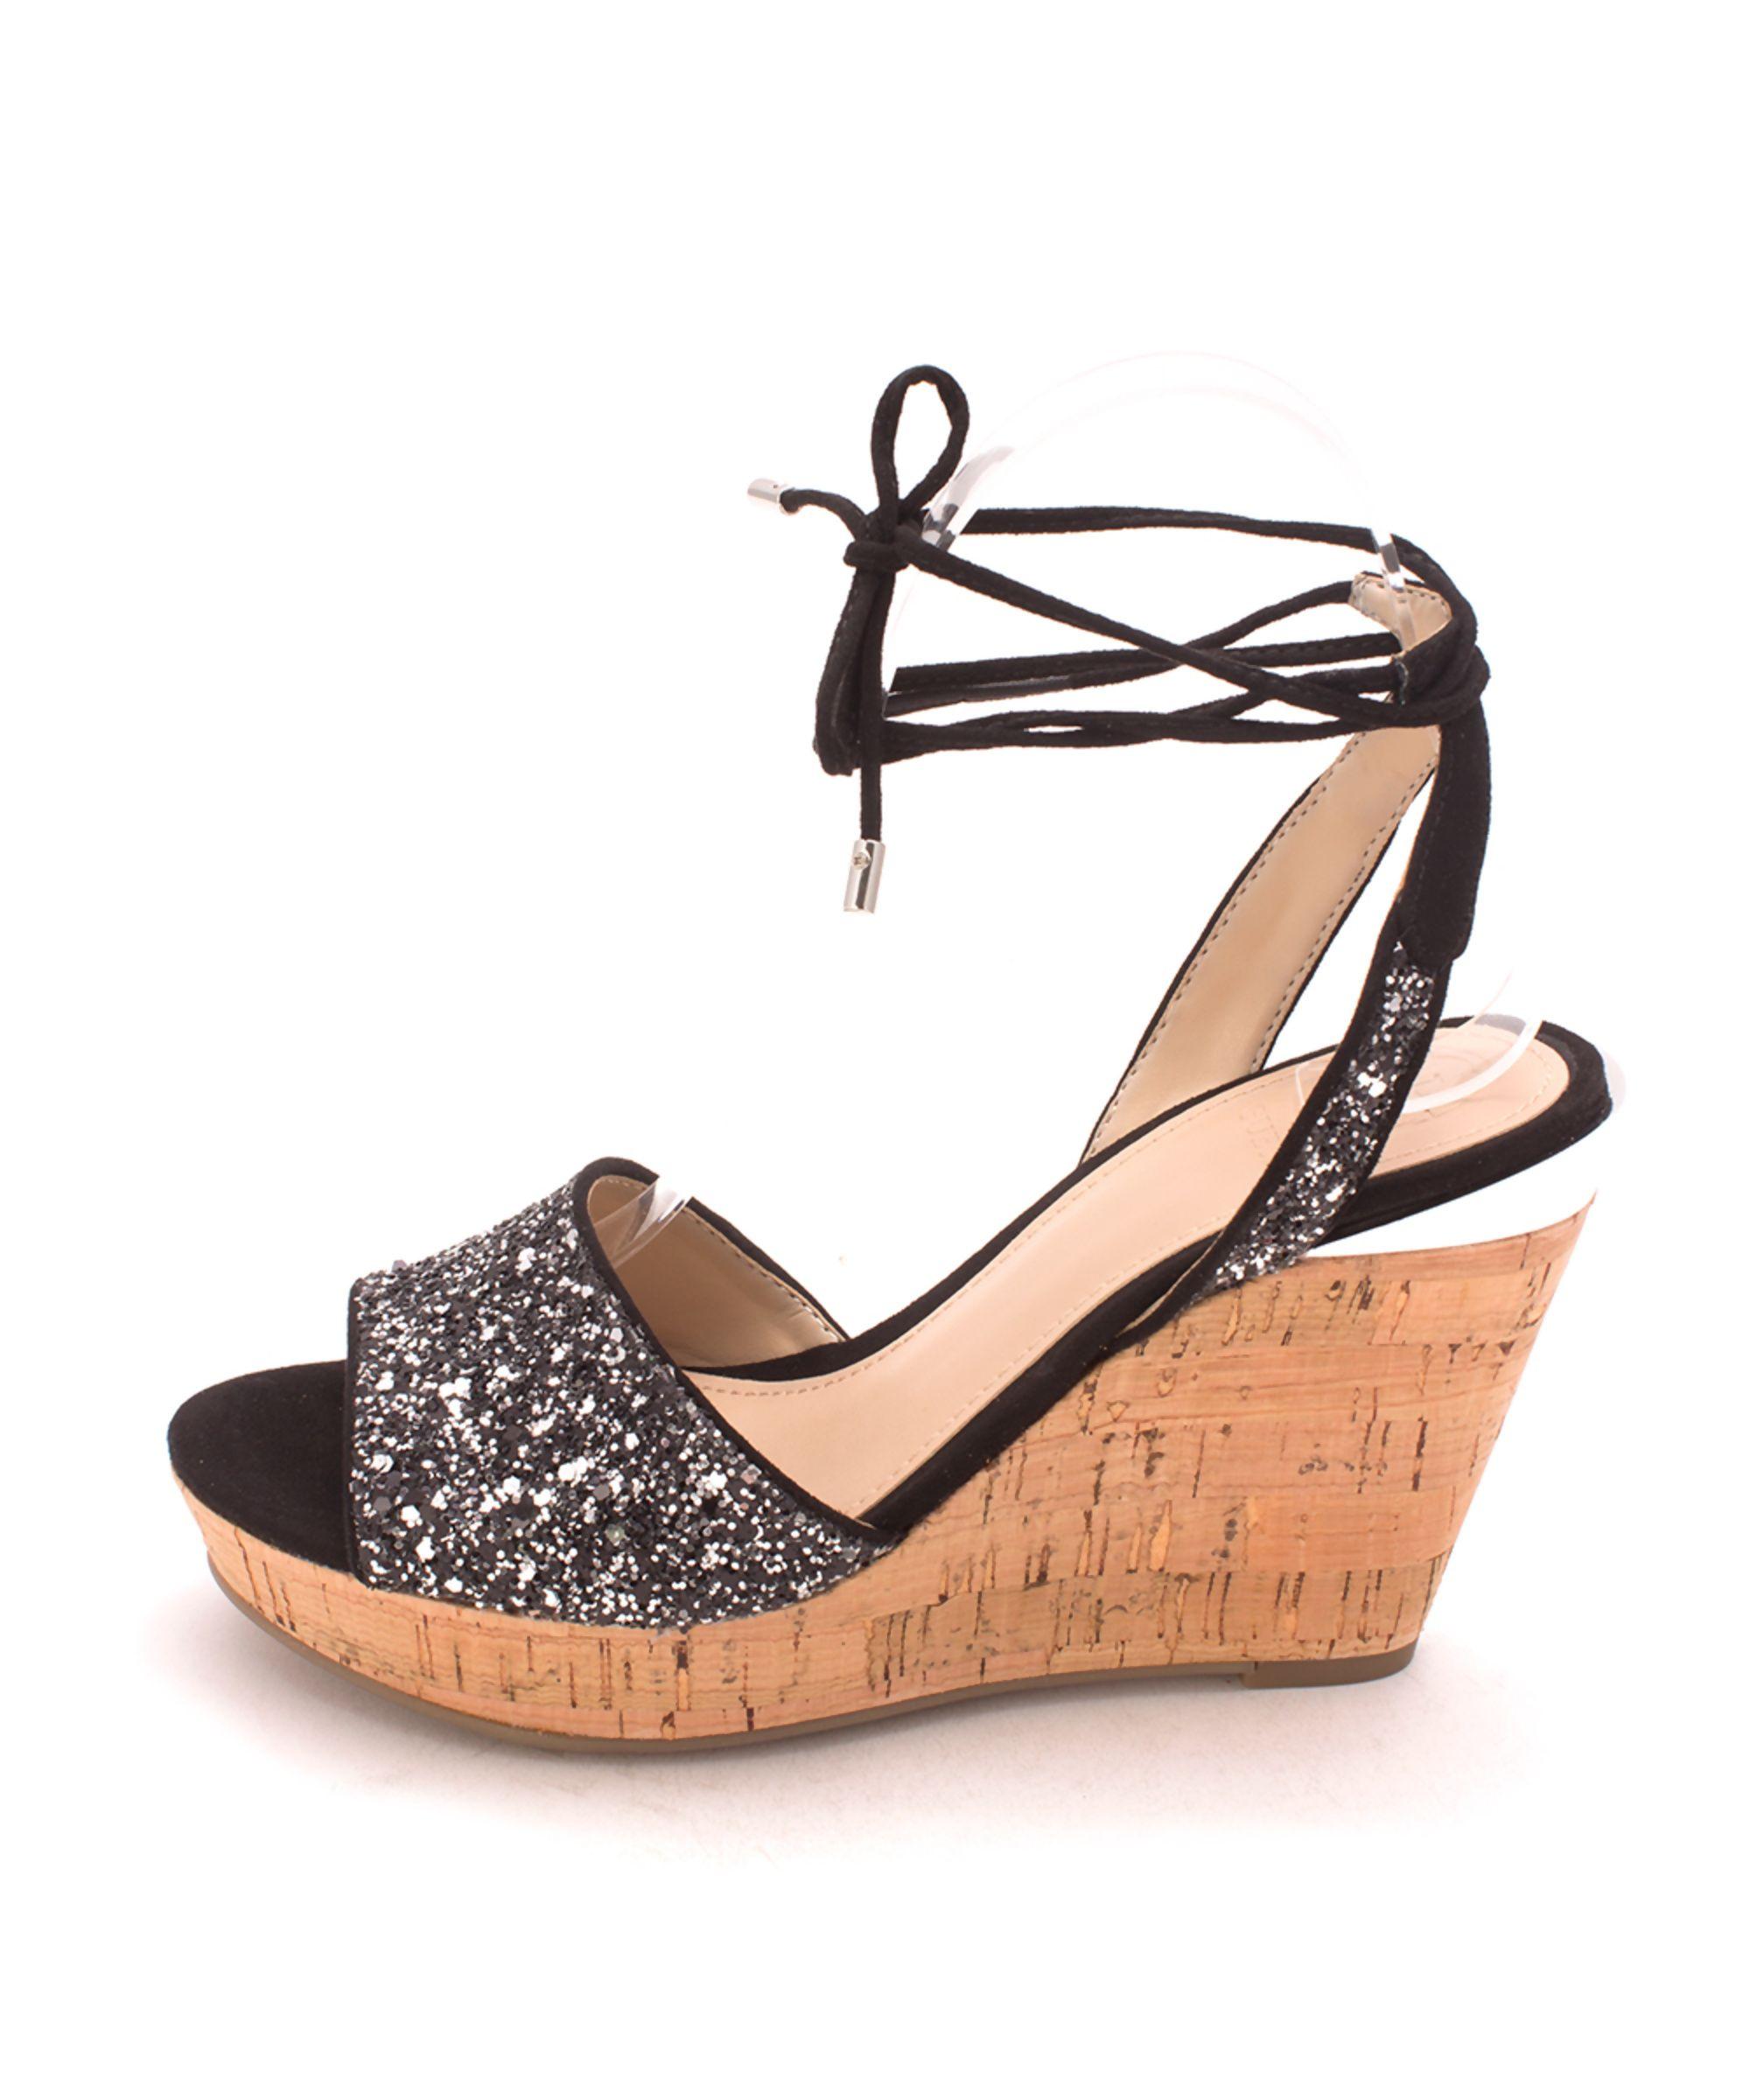 GUESS | Guess Womens Edinna2 Open Toe Casual Platform Sandals #Shoes # Sandals #GUESS